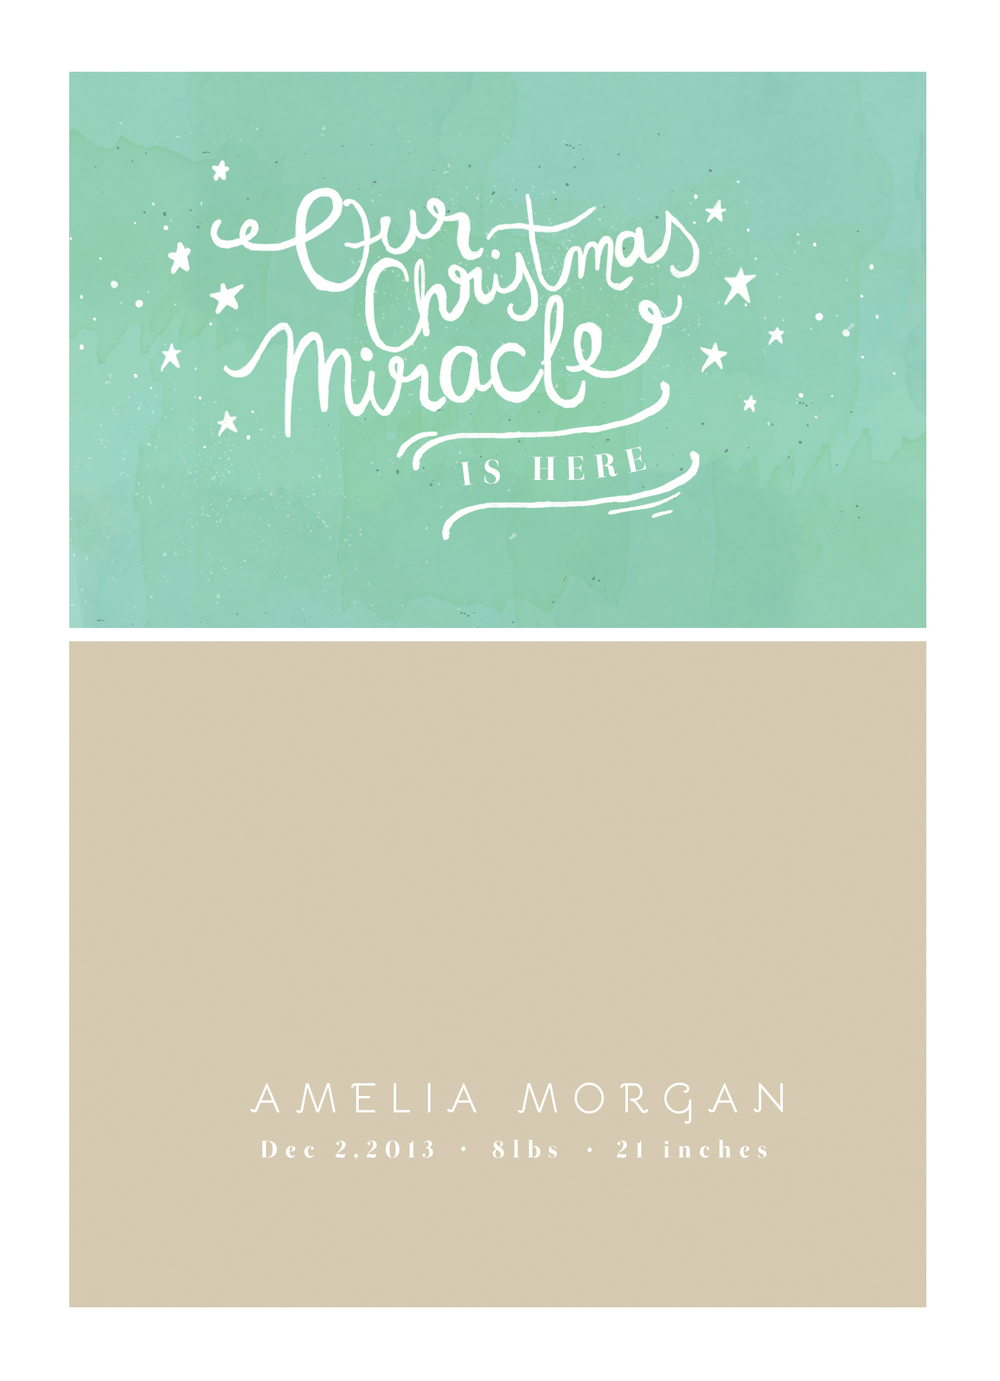 christmasmircle_5x7whcccard2front_ohsnap.jpg